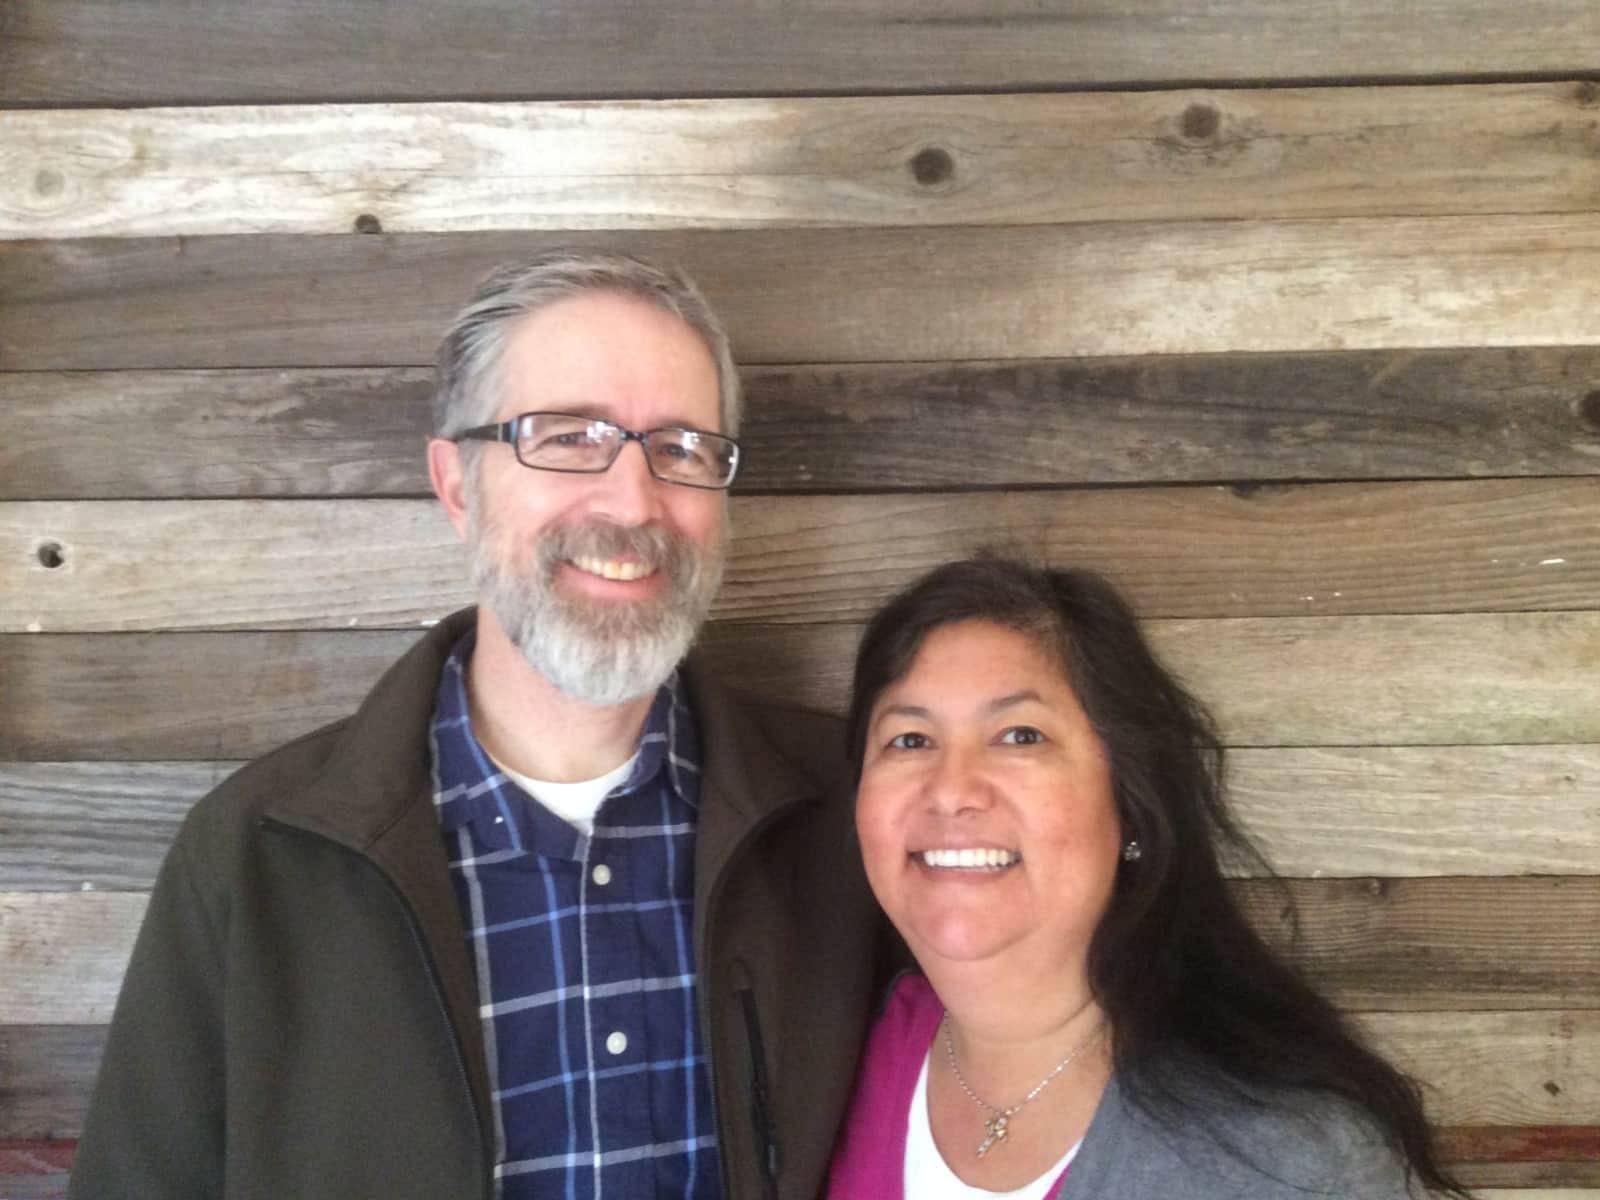 Richard & Maricela from Pleasanton, California, United States